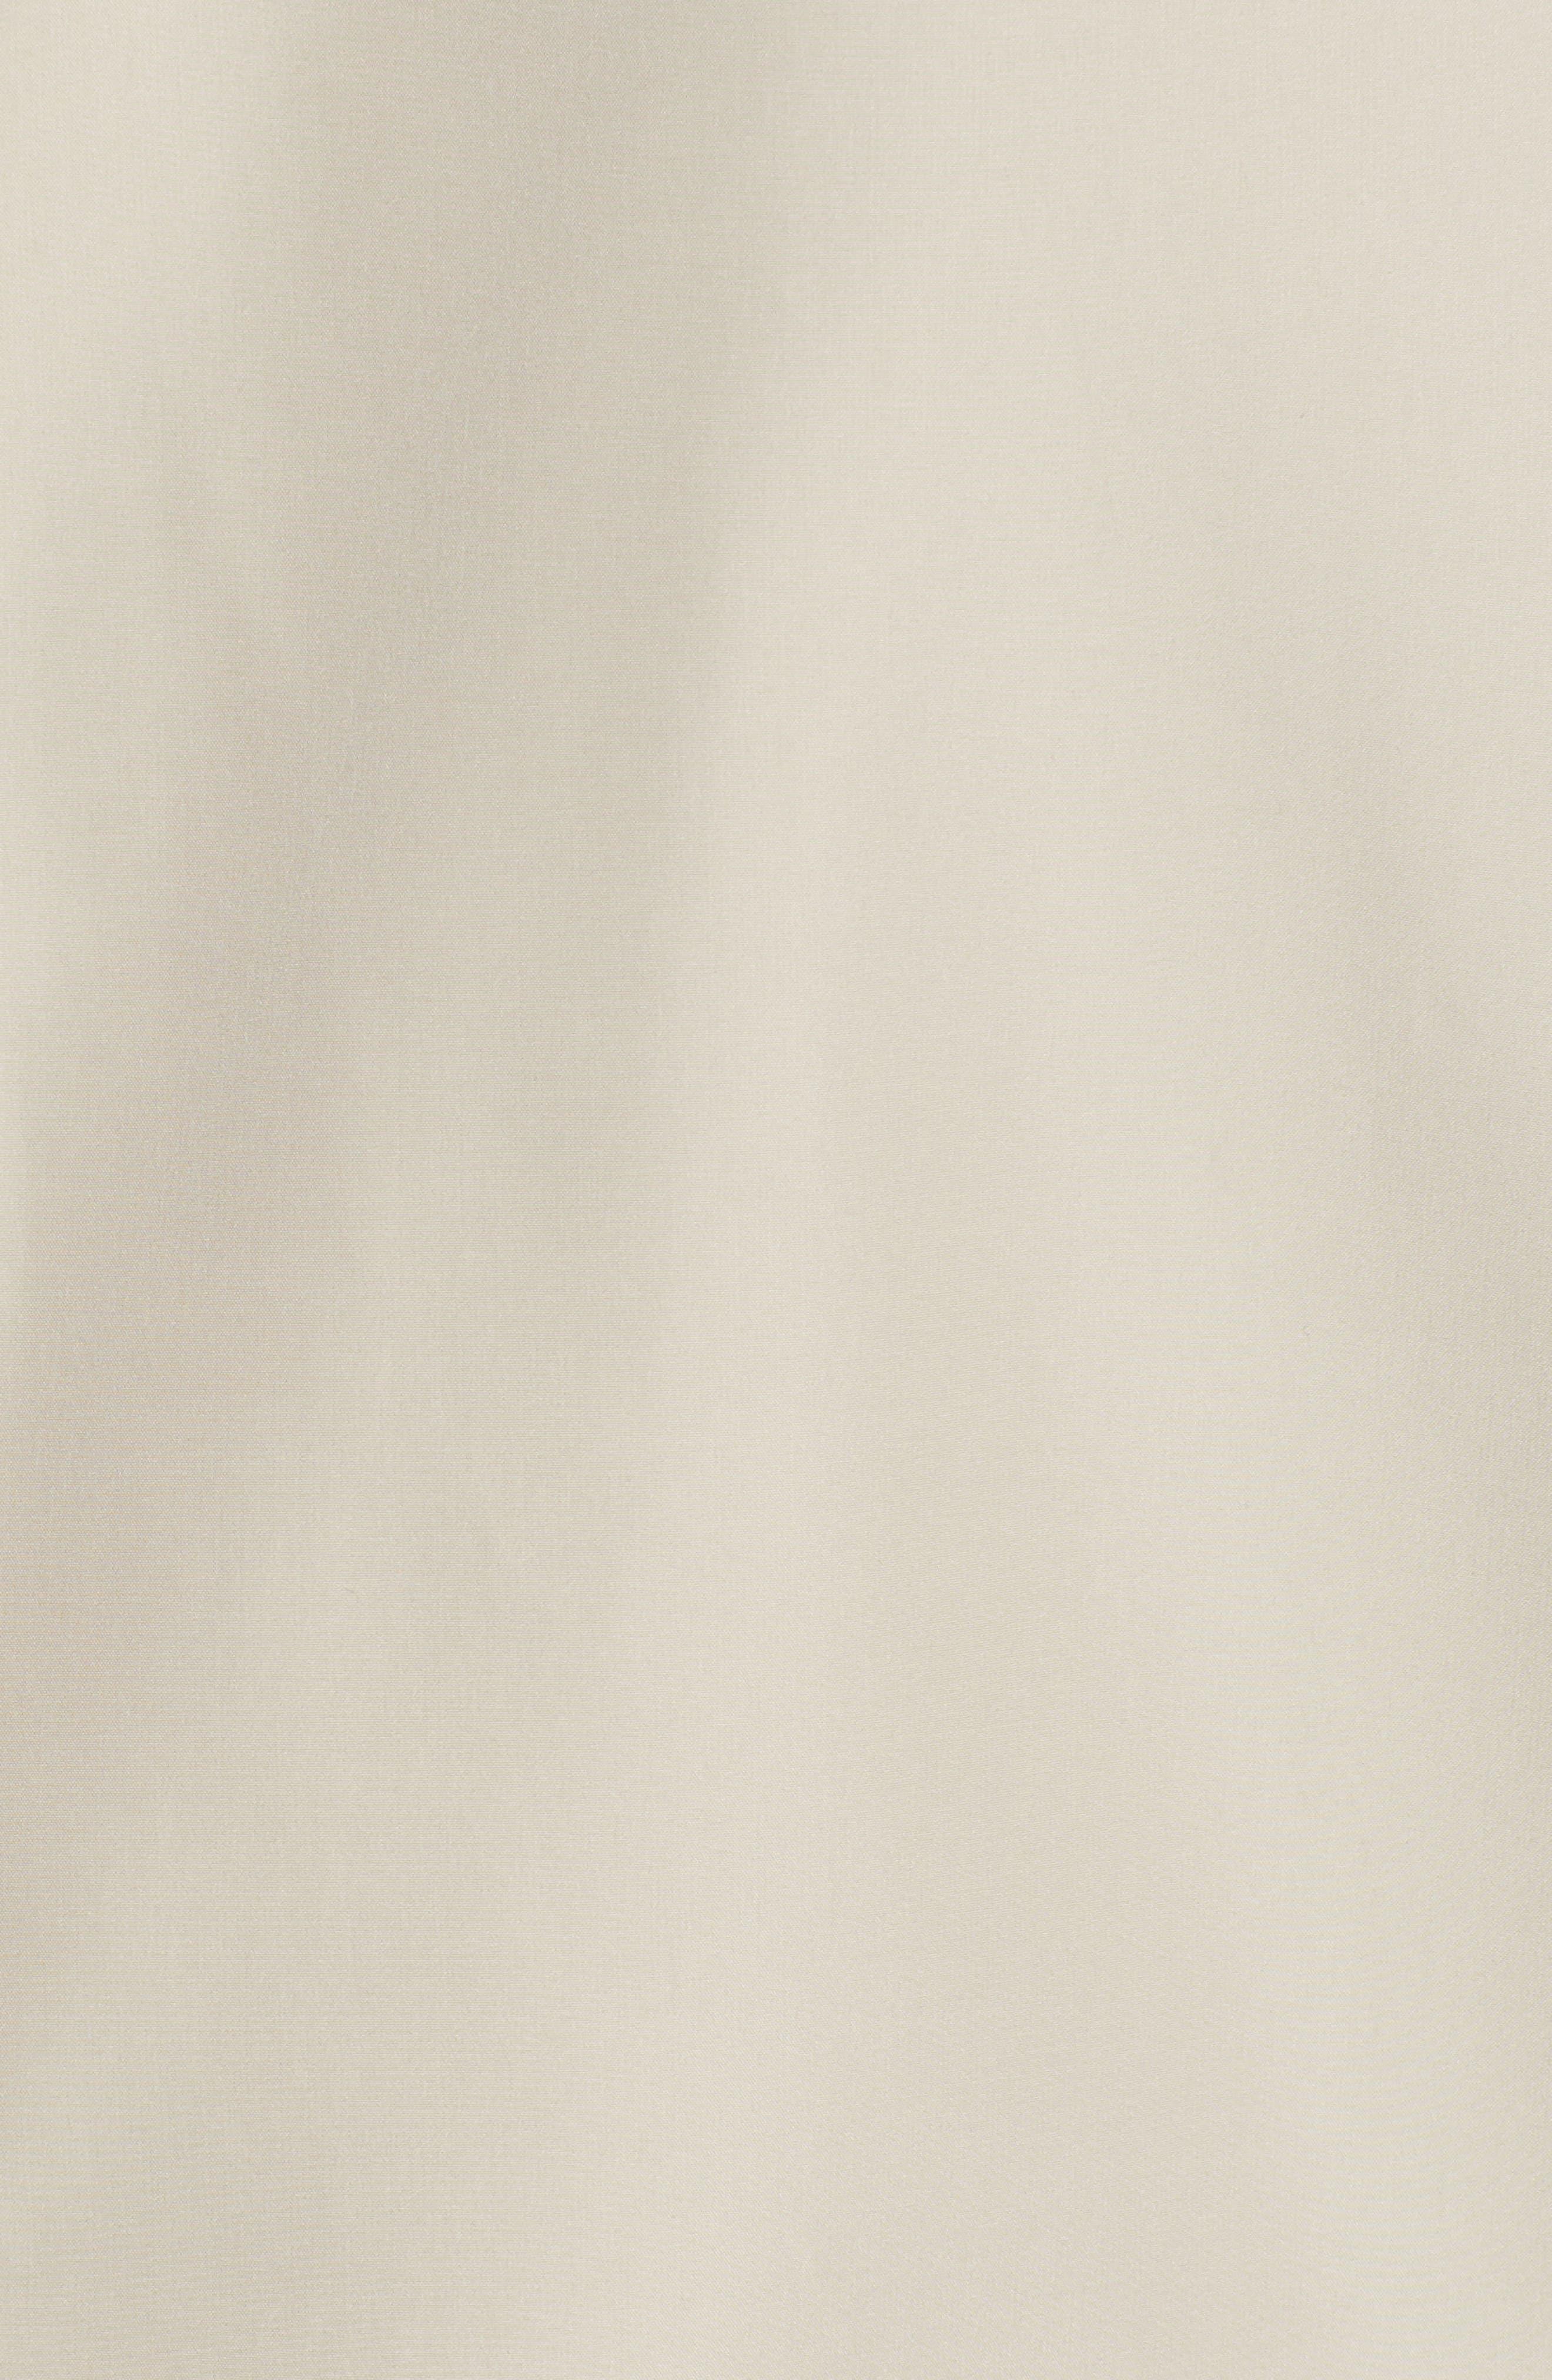 Slim Fit Lightweight Jacket,                             Alternate thumbnail 7, color,                             KHAKI